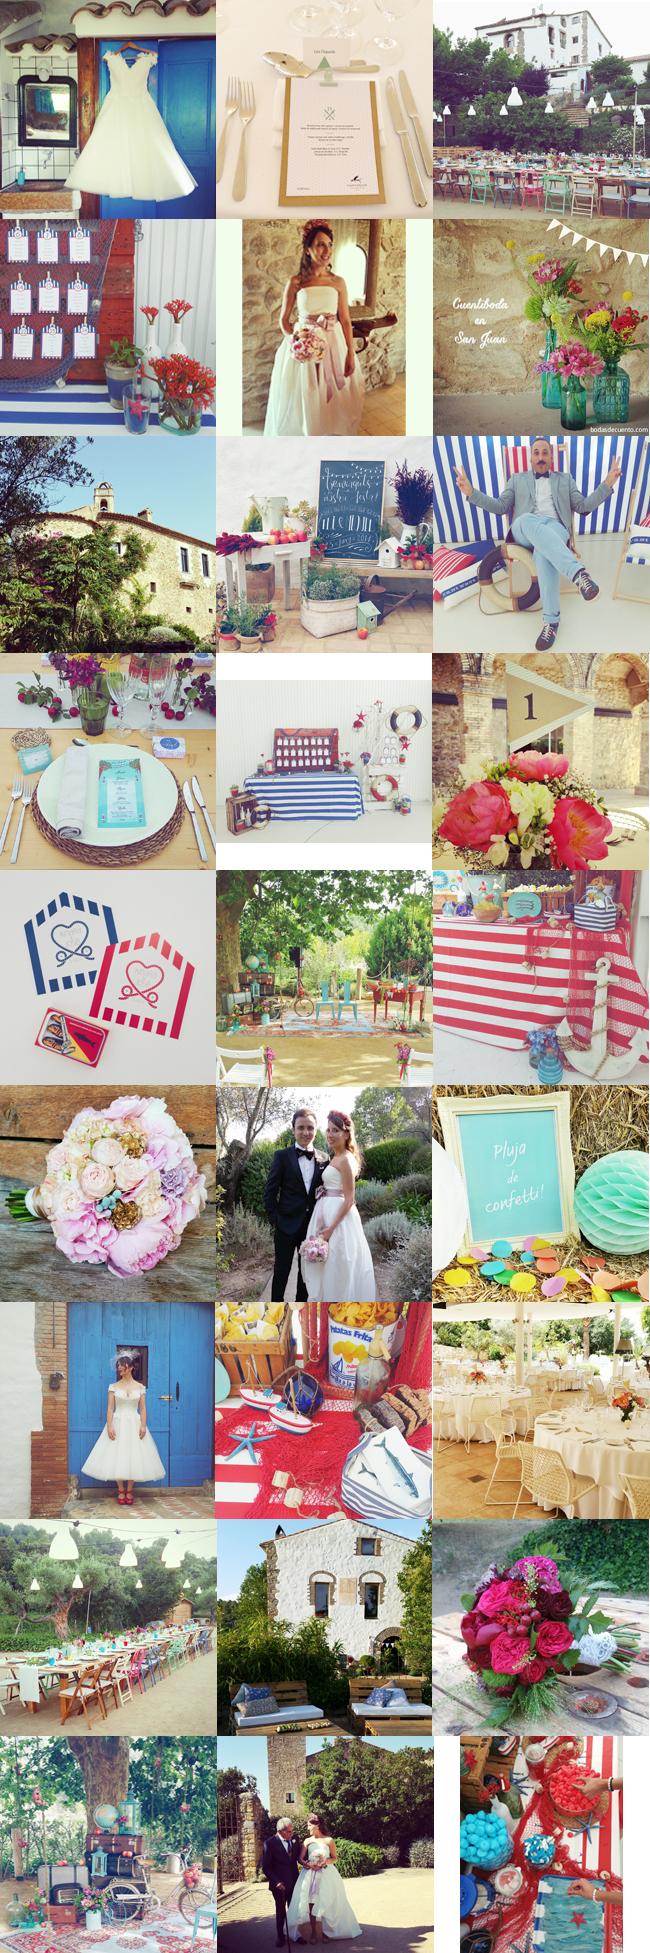 Organización de Bodas Wedding Planner Valencia, Girona y Tarragona www.bodasdecuento.com